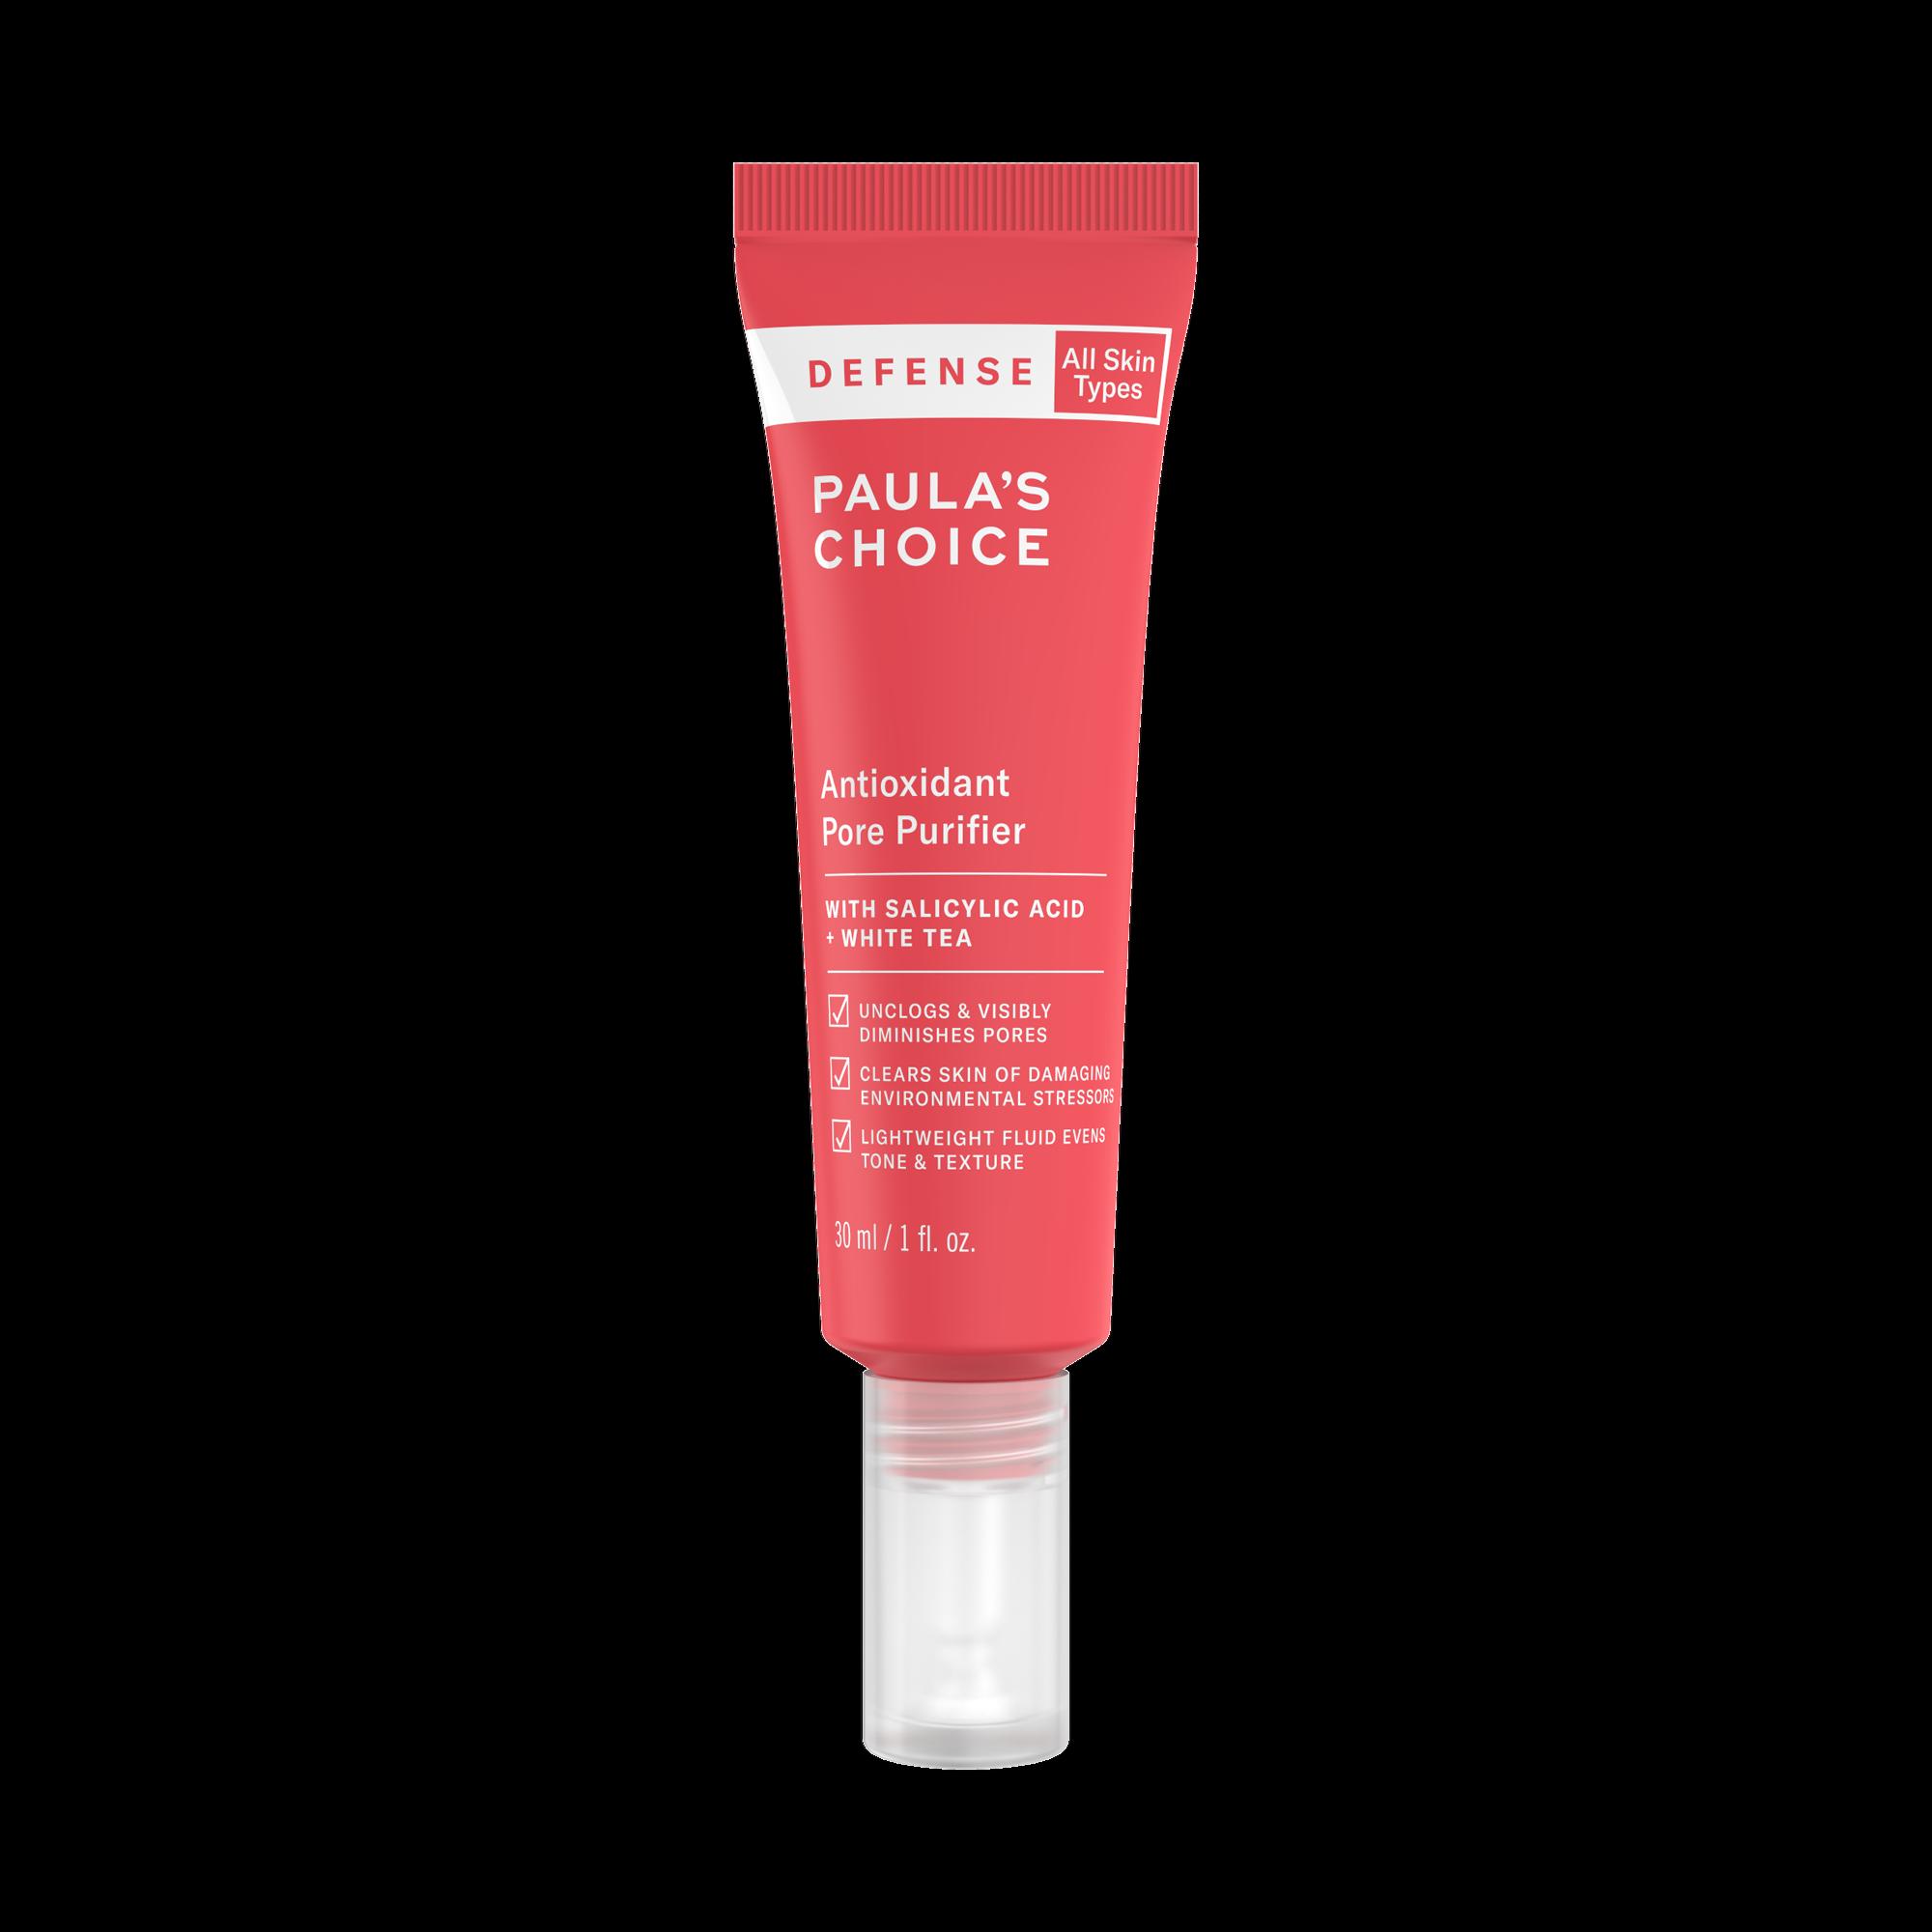 Antioxidant Pore Purifier